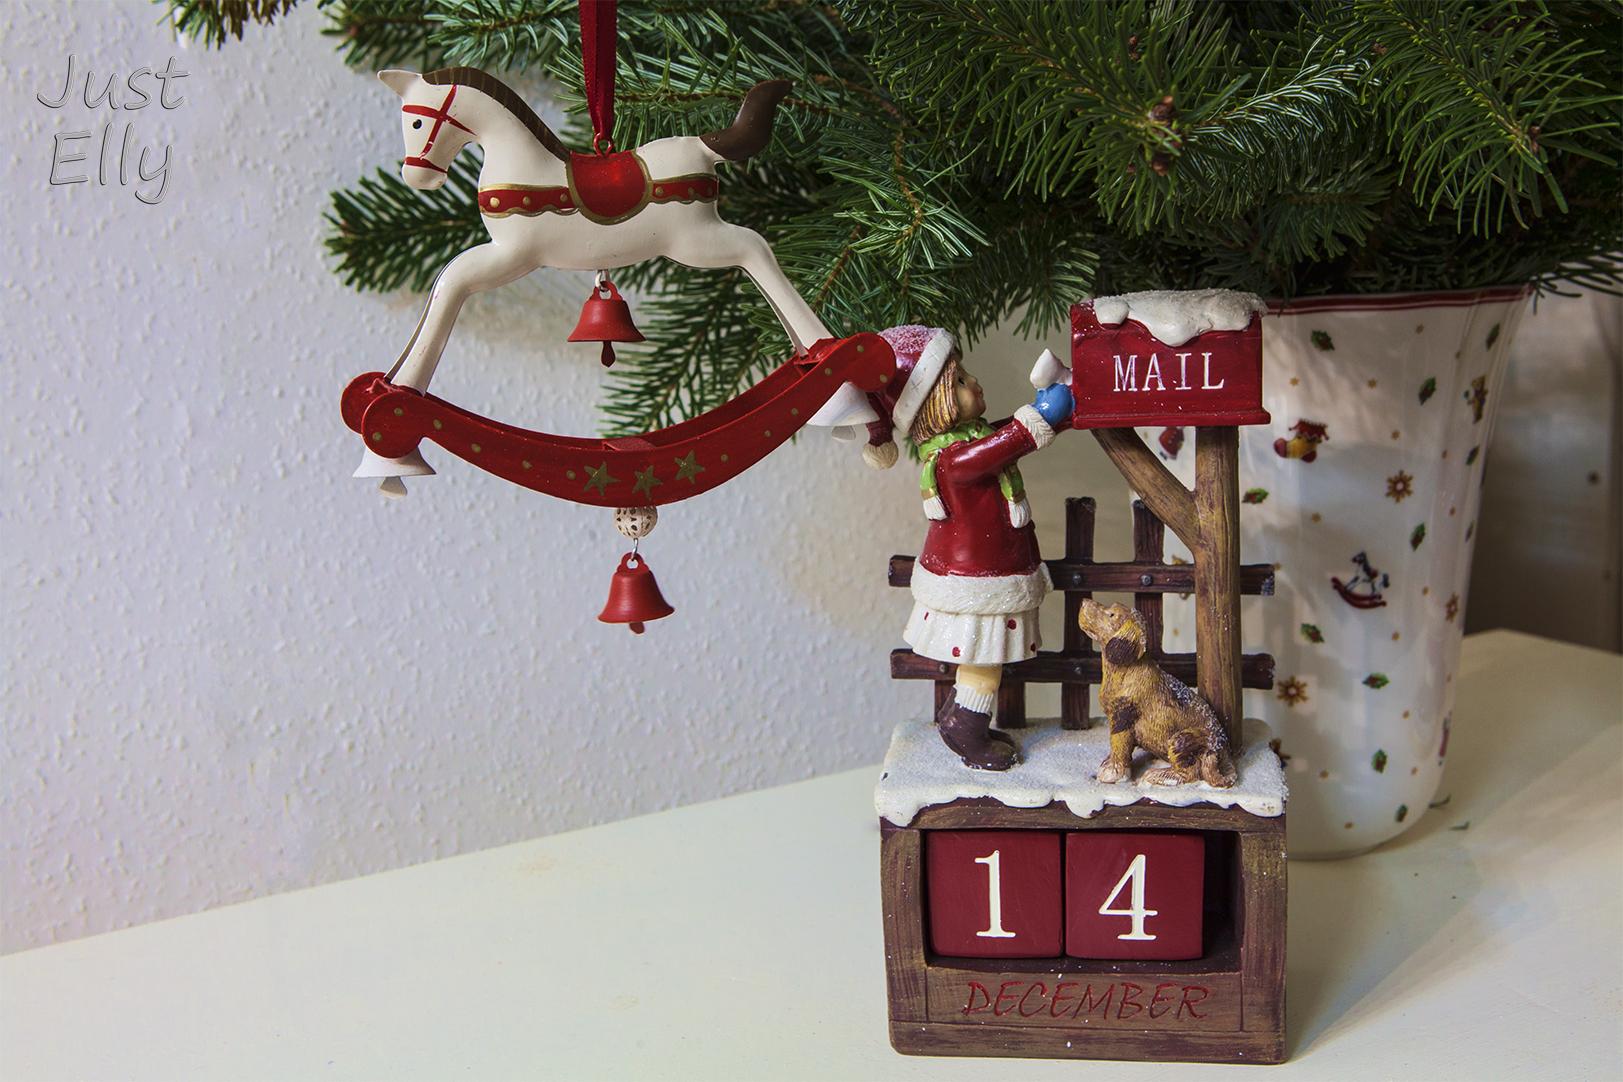 December 14th - My advent calendar